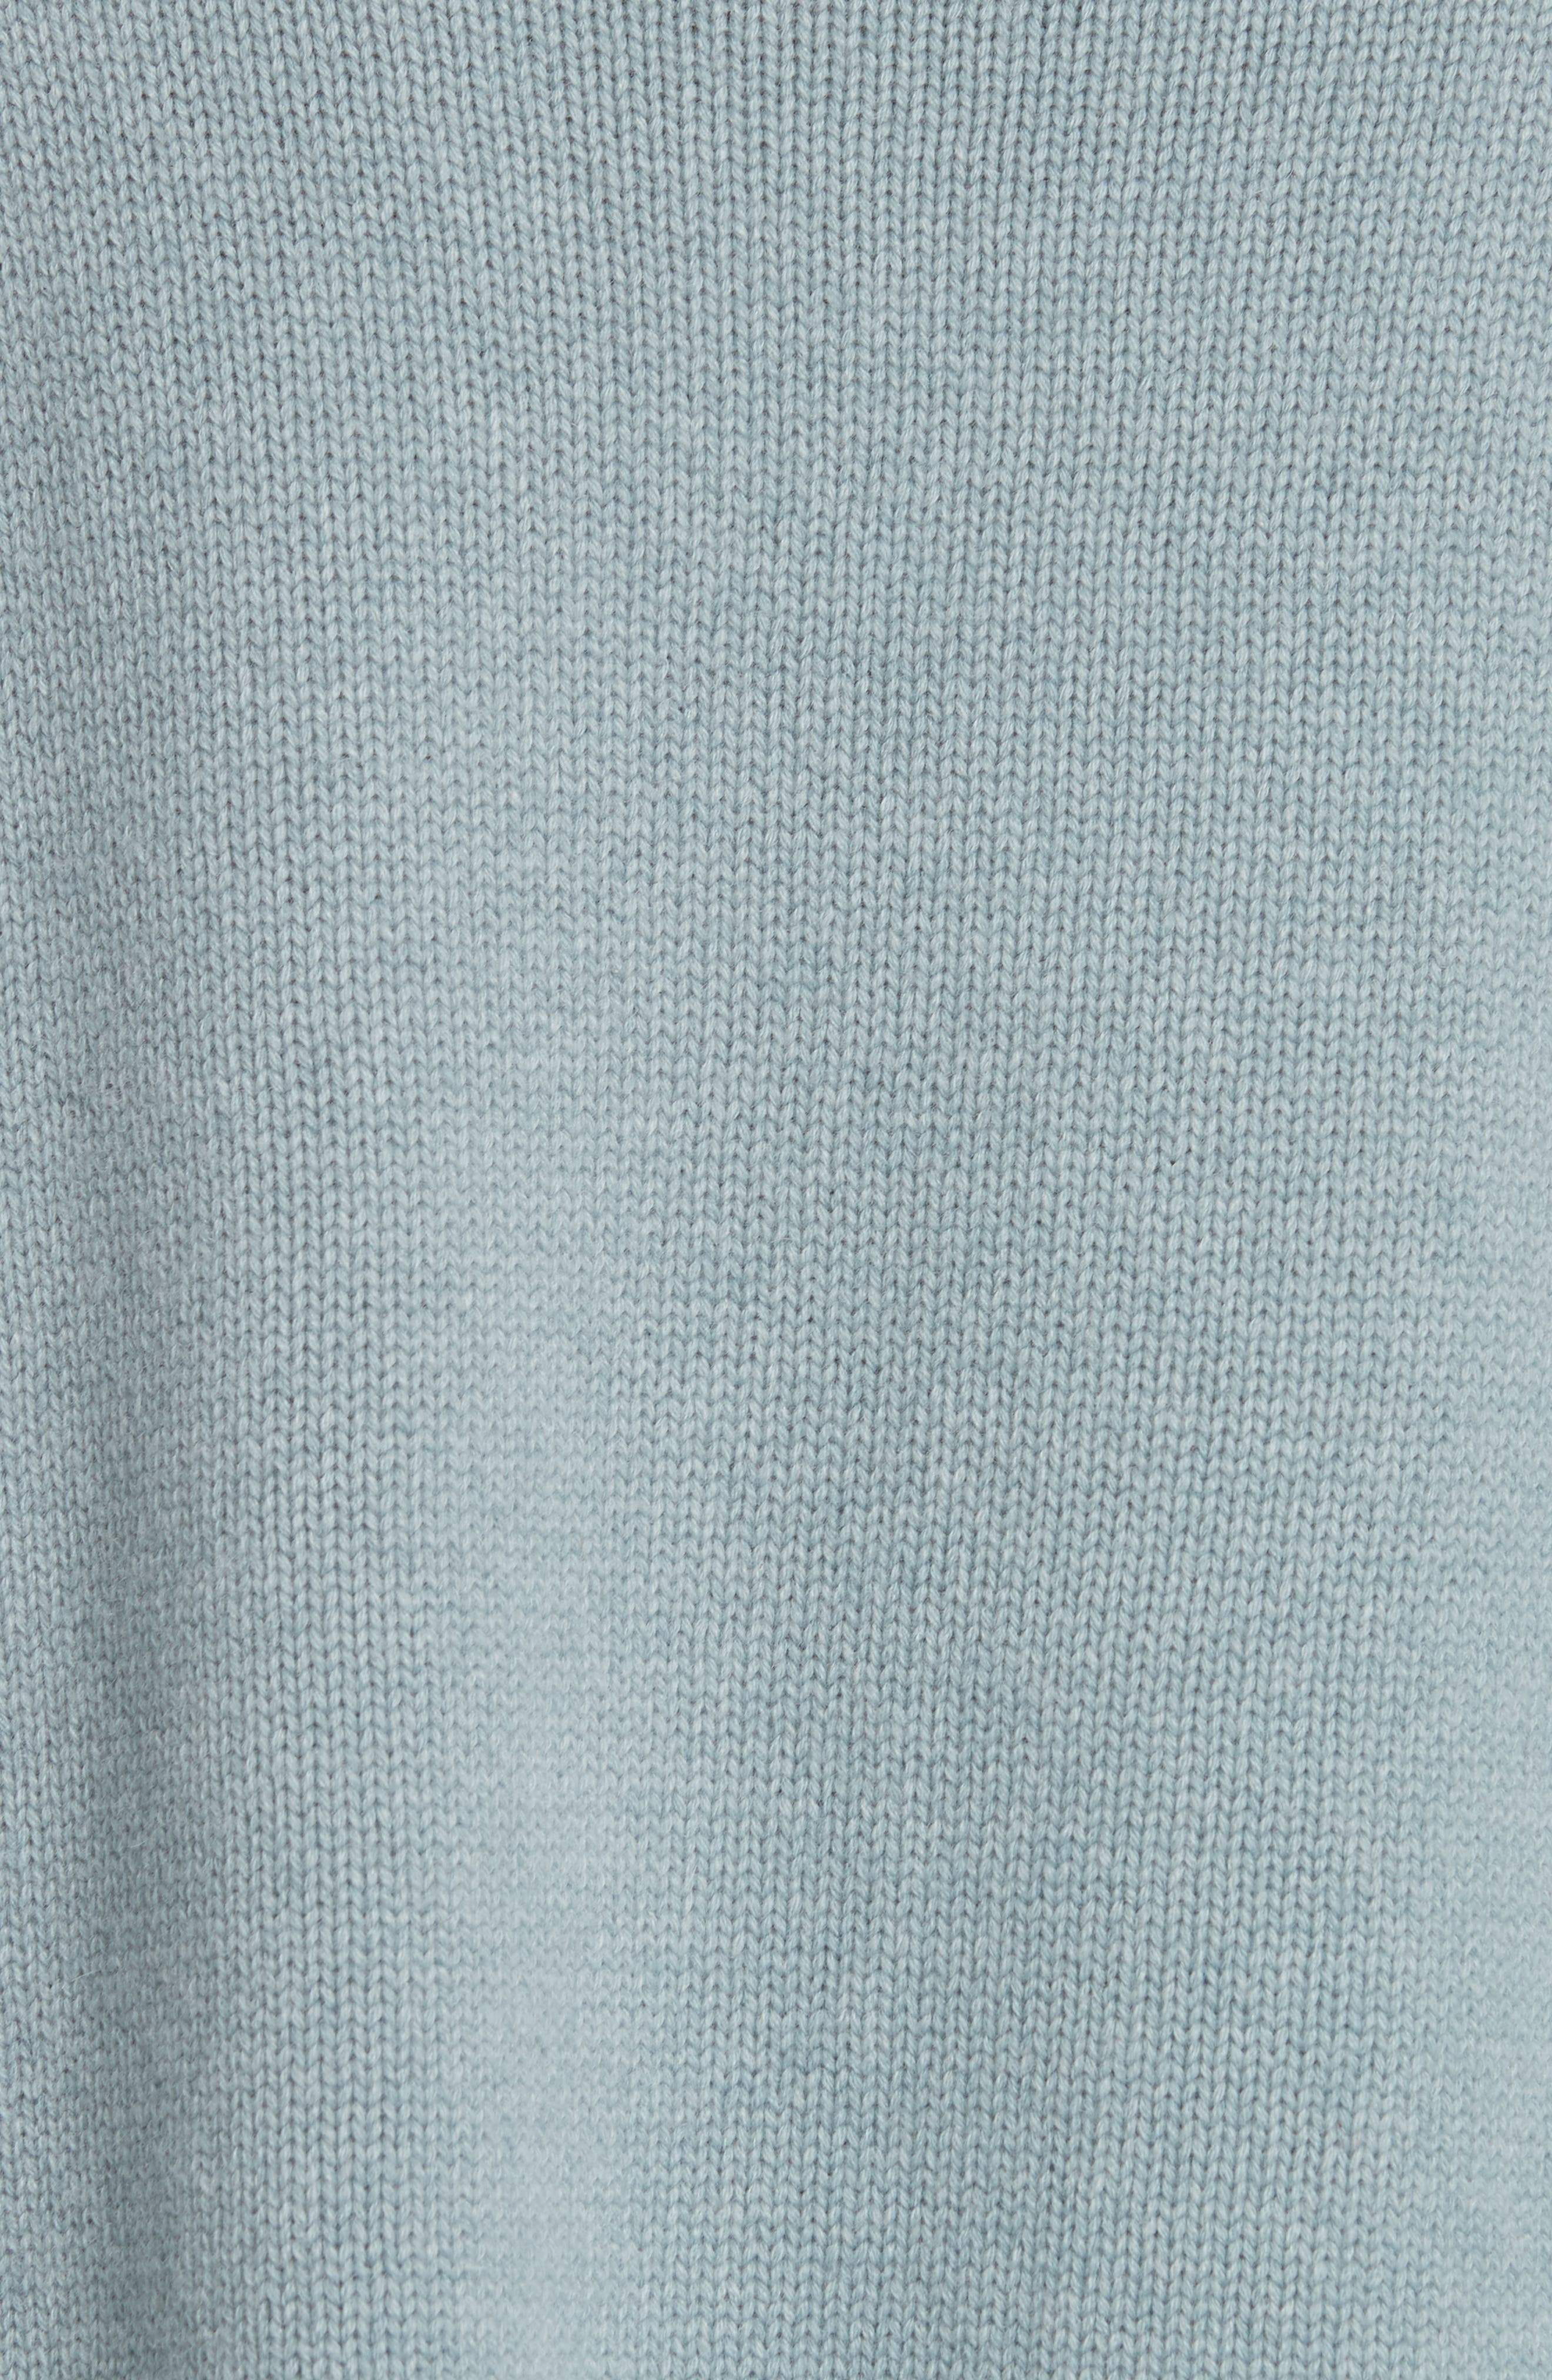 NILI LOTAN, Mariah Funnel Neck Cashmere Sweater, Alternate thumbnail 5, color, SKY BLUE